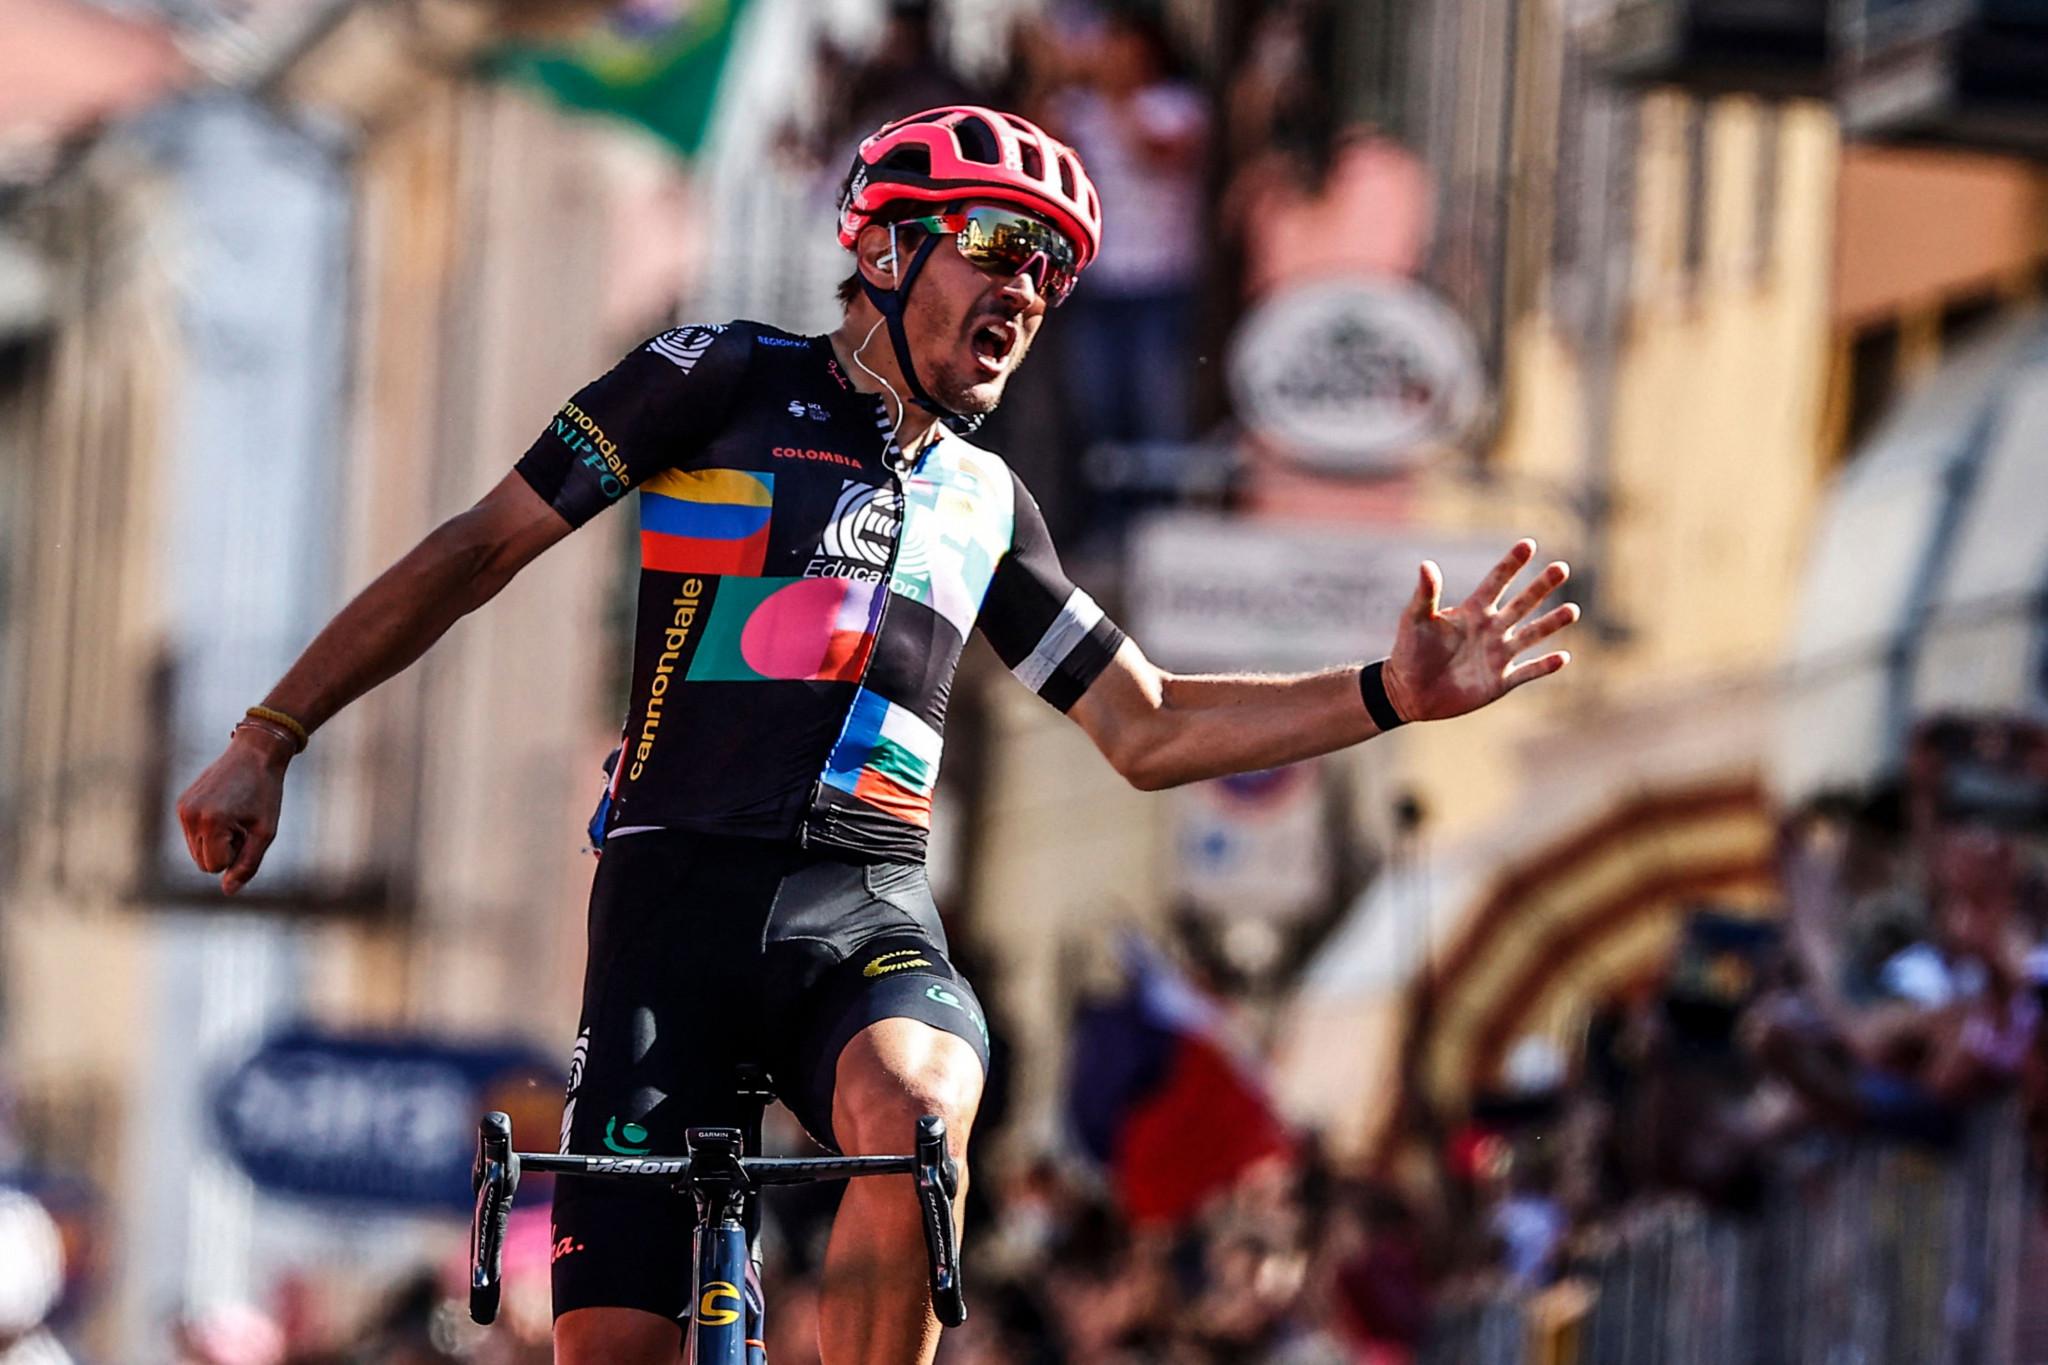 Bettiol wins stage 18 of Giro d'Italia from breakaway